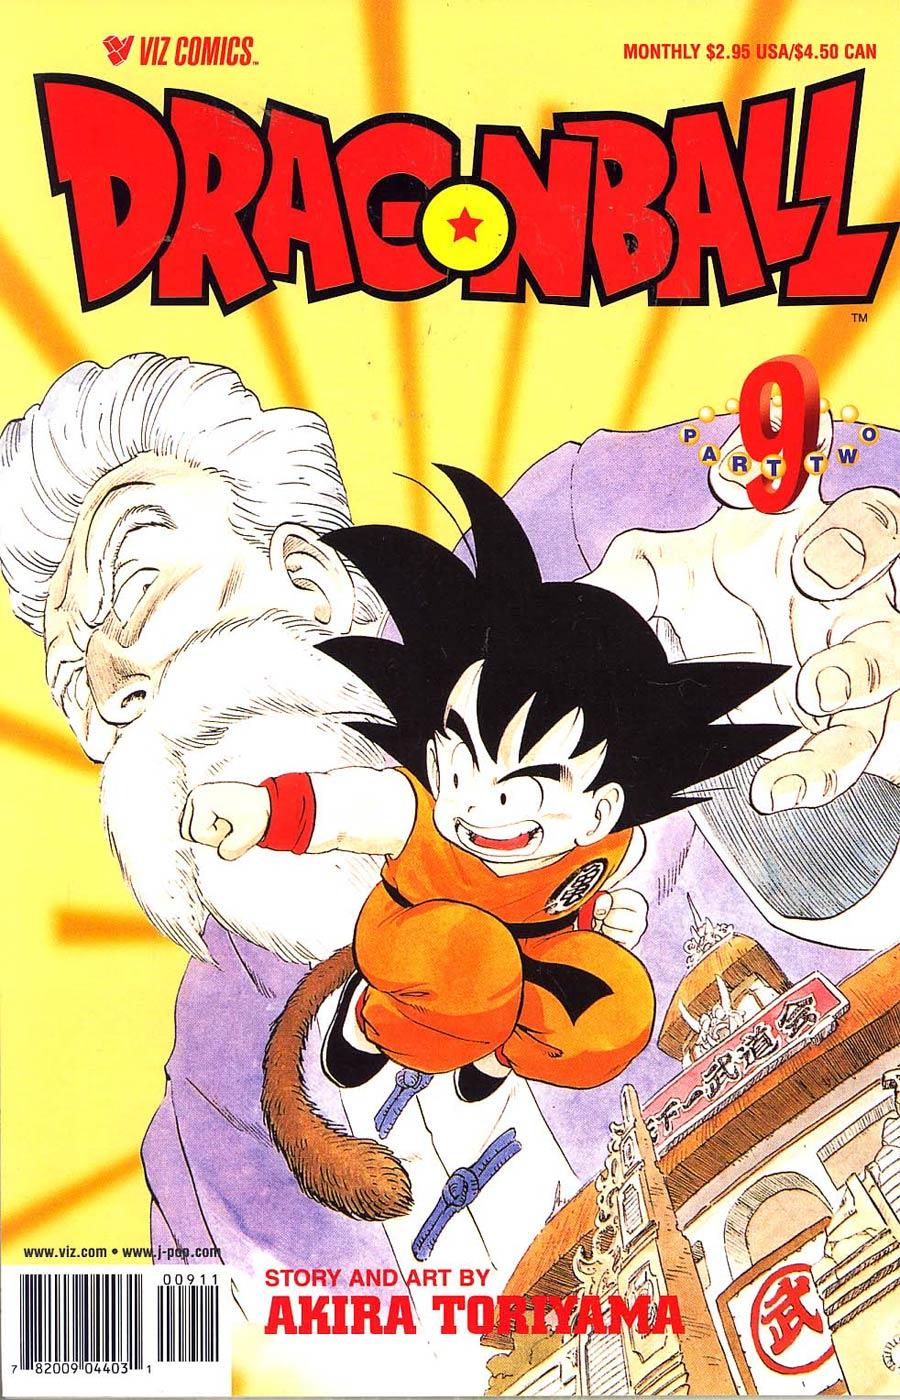 Dragon Ball Part 2 #9